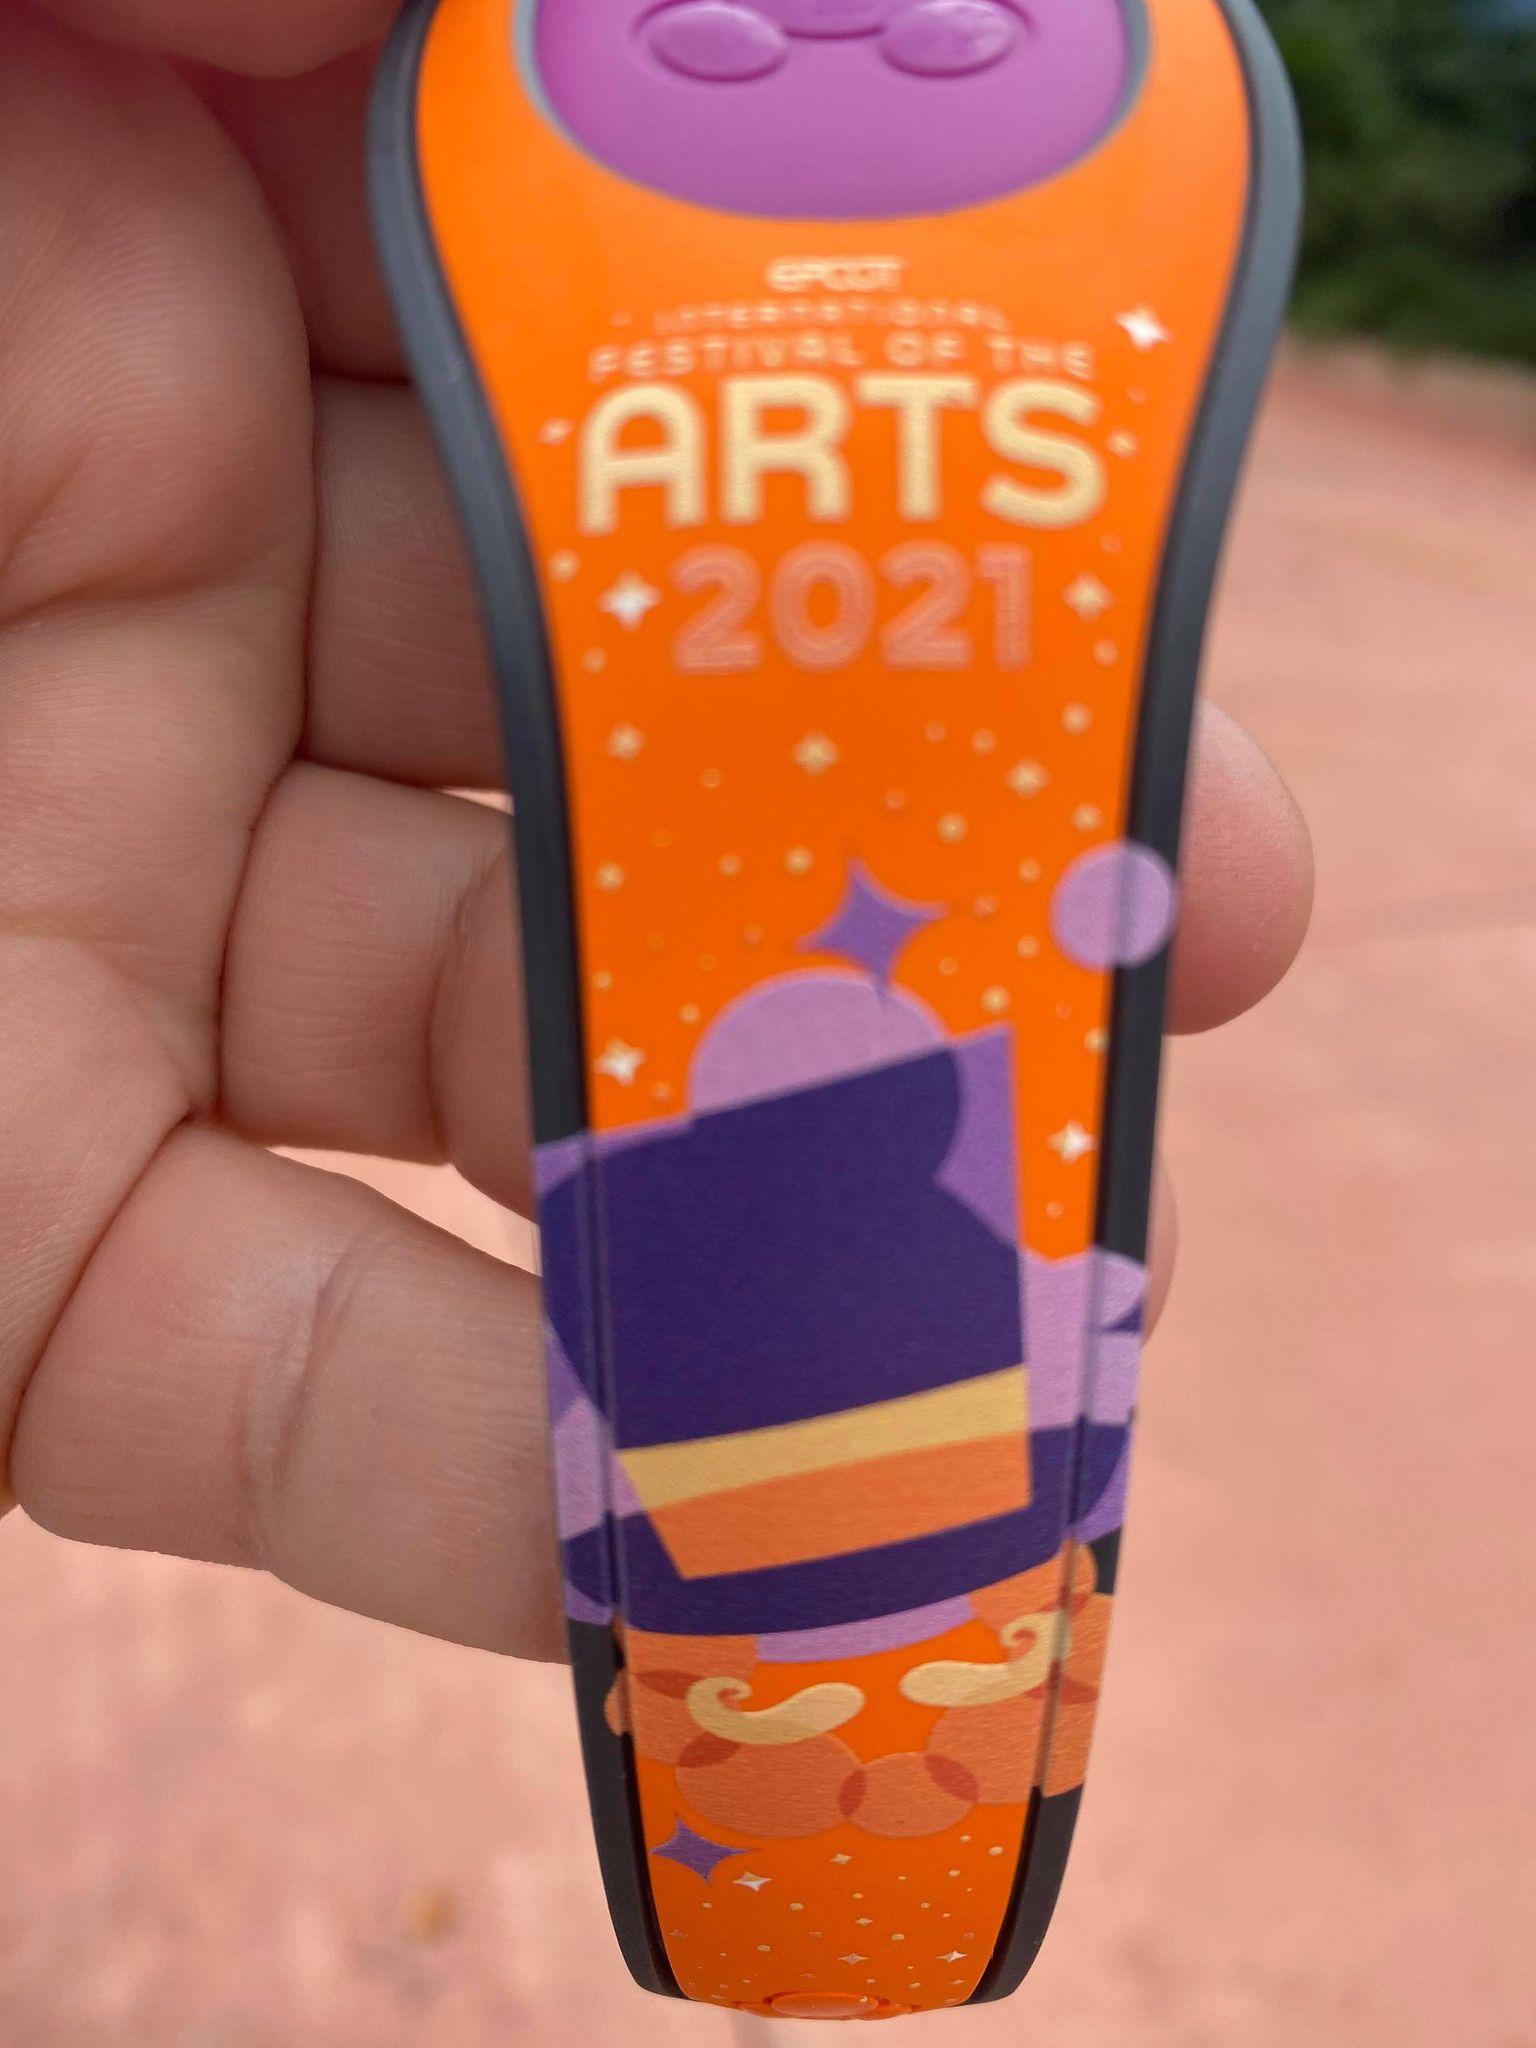 Arts Festival MagicBand